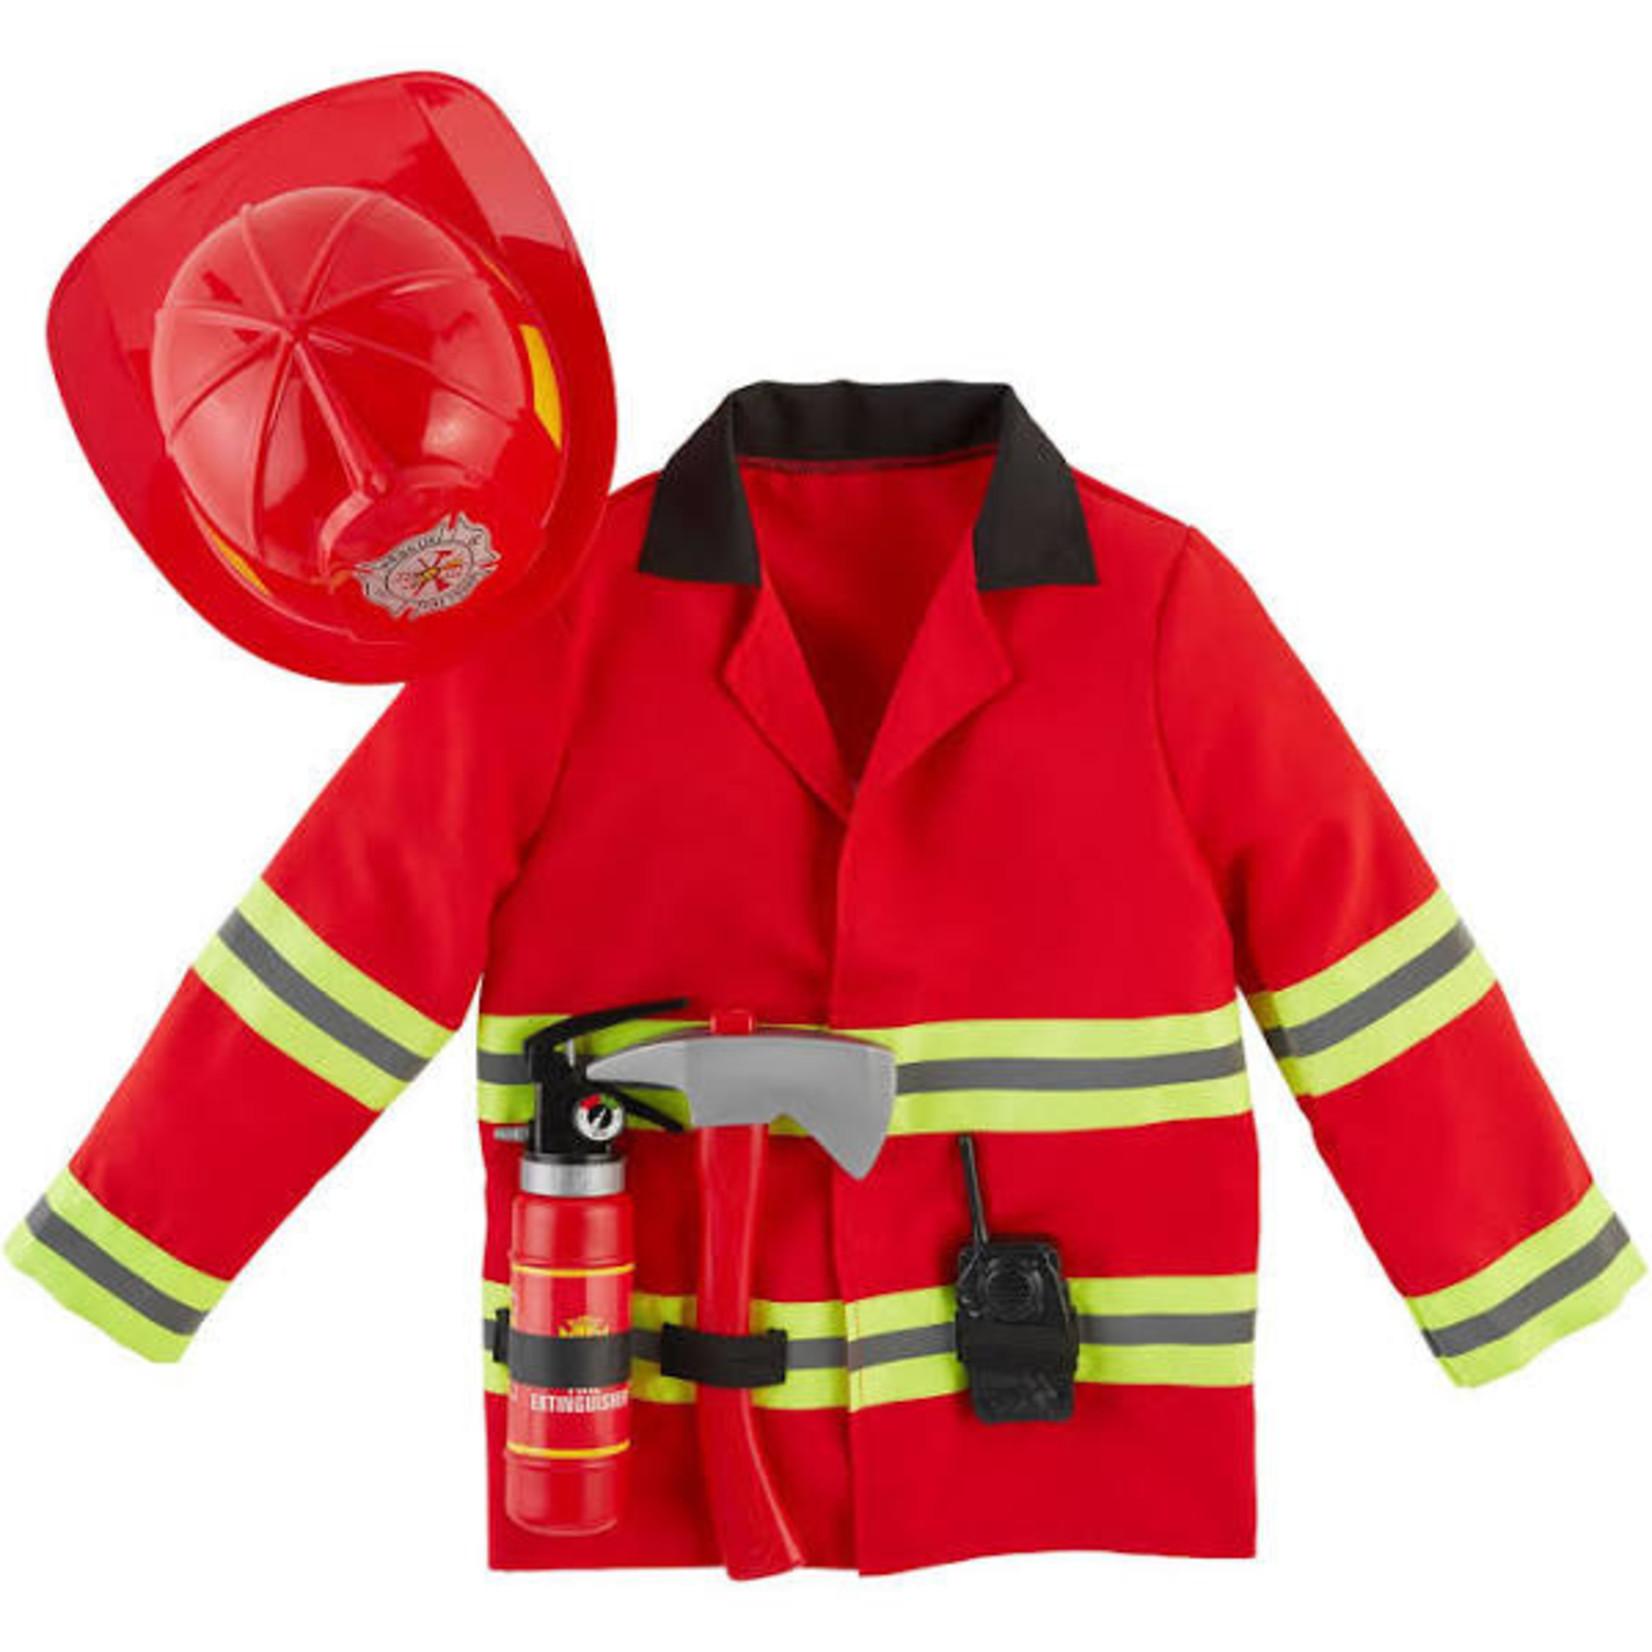 Mudpie Fire Fighter Dress Up Set